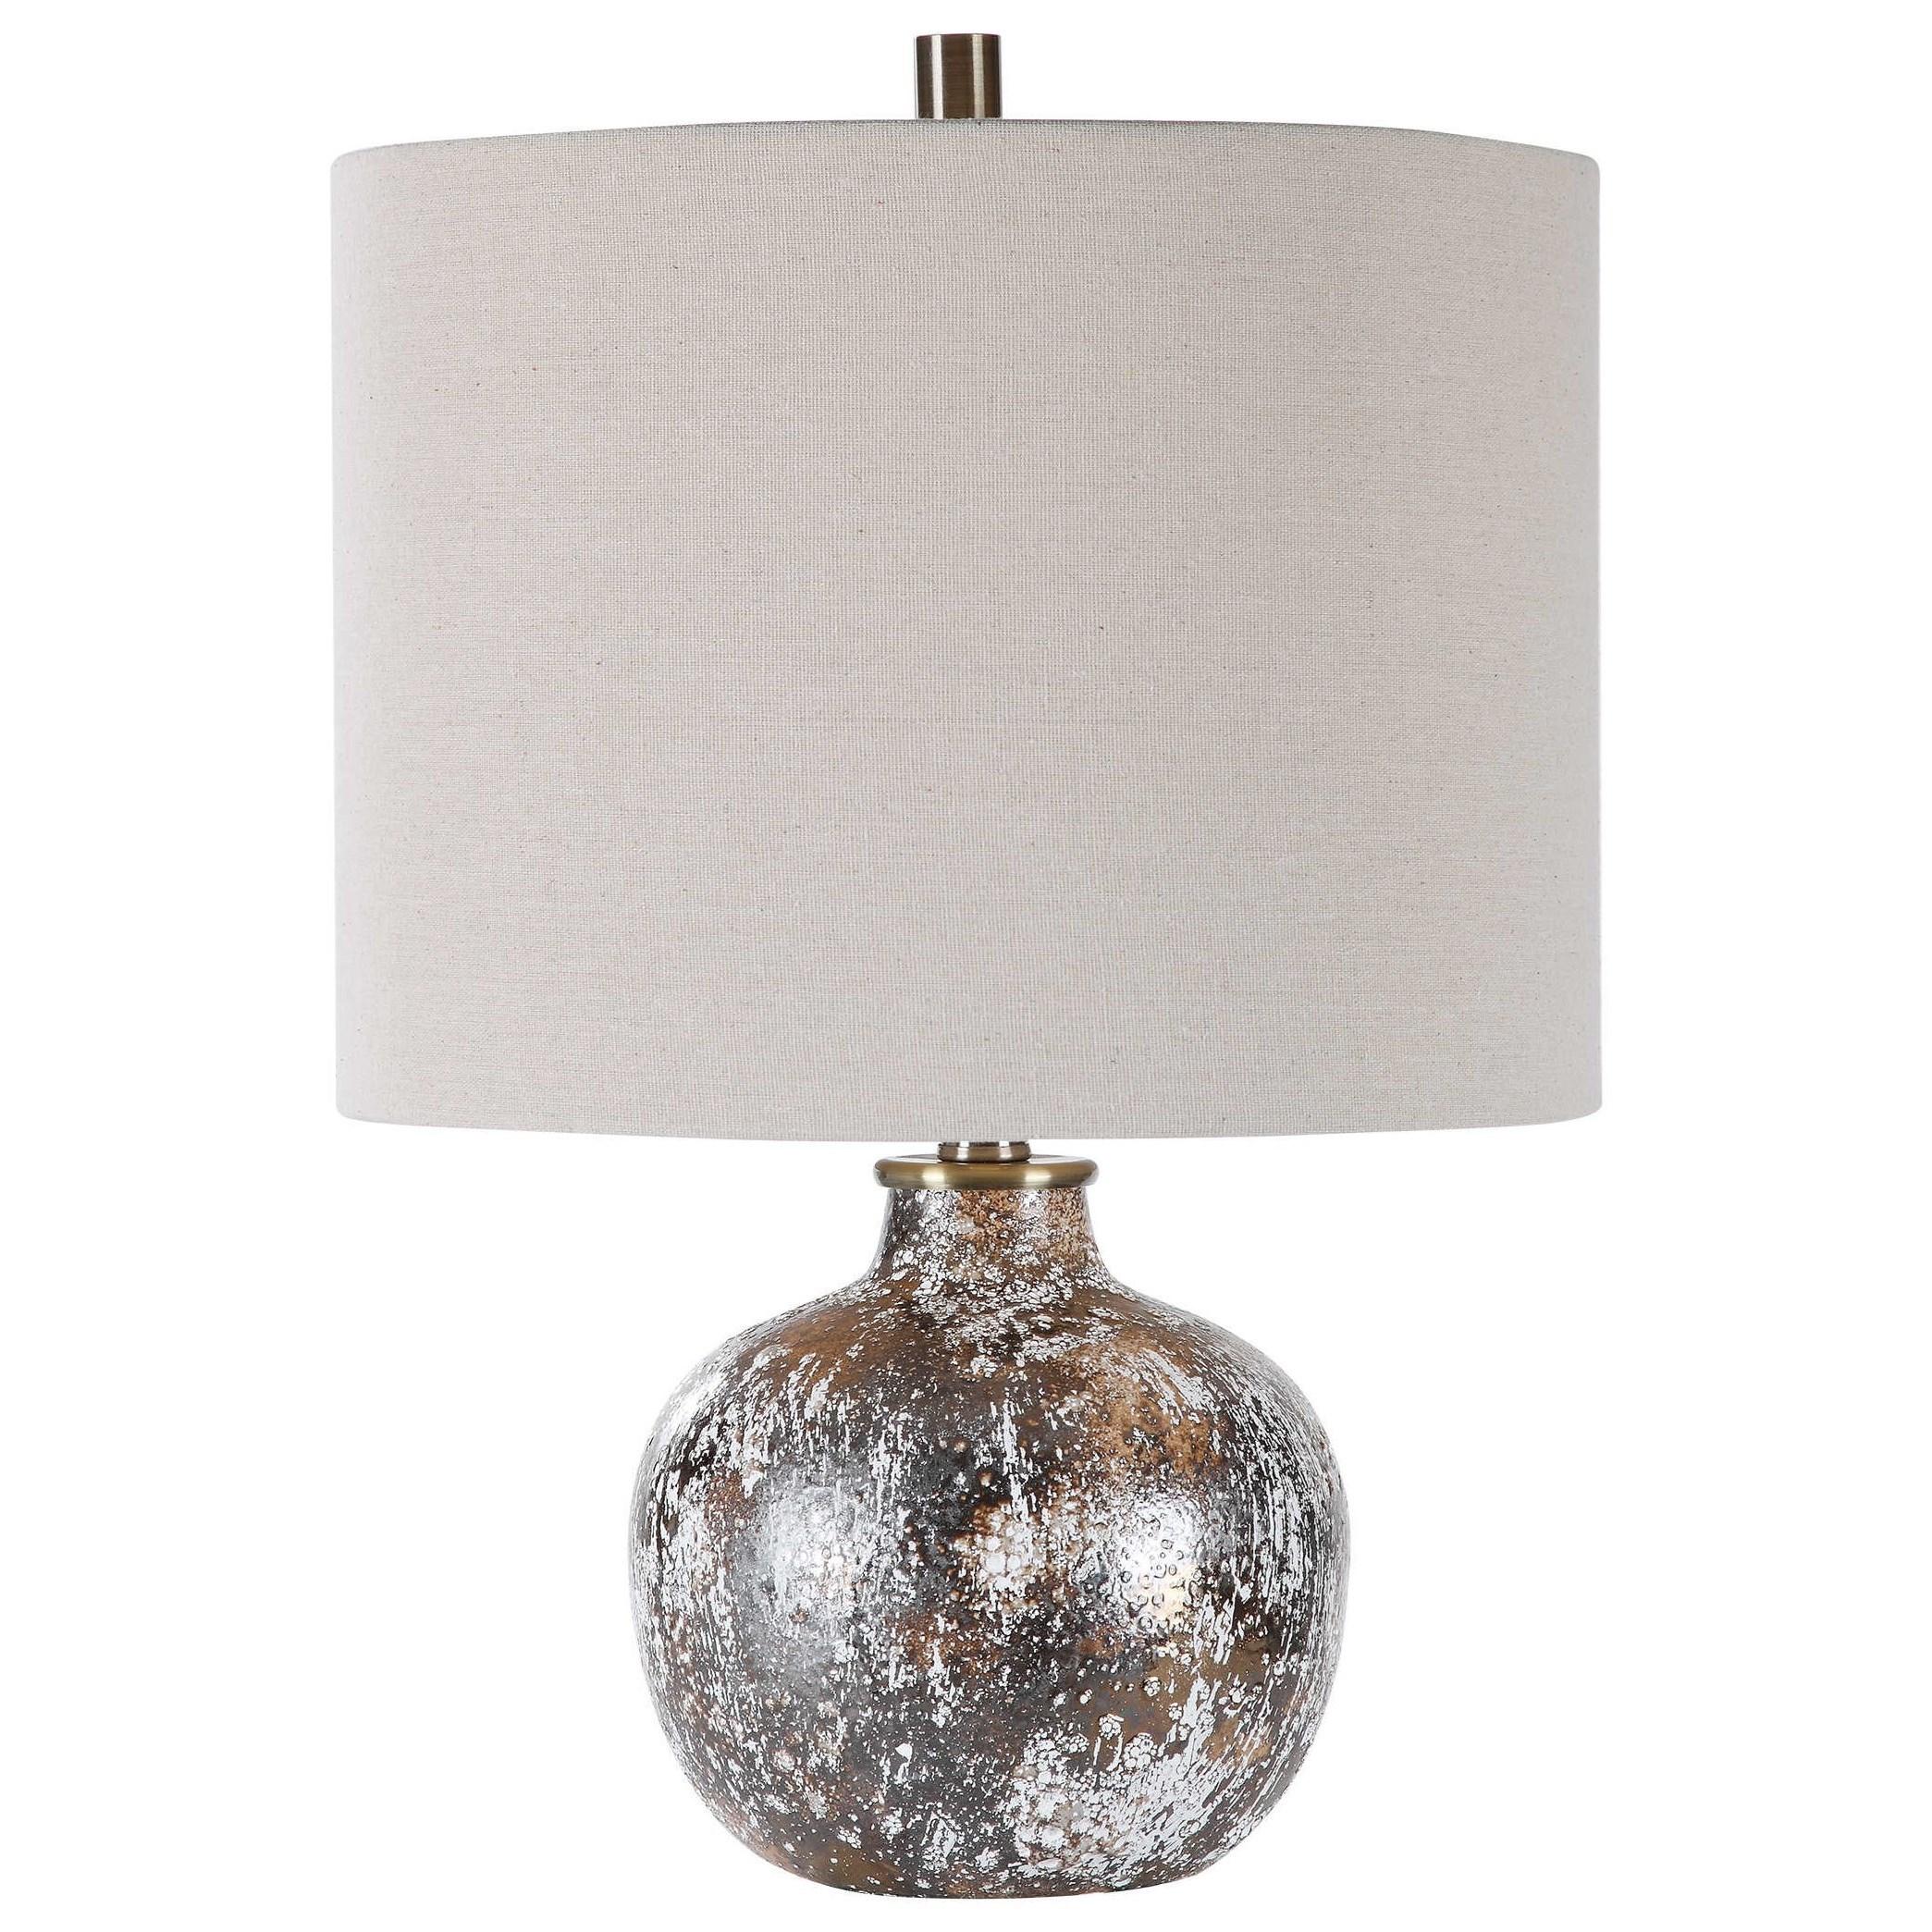 Accent Lamps Luanda Ceramic Accent Lamp by Uttermost at Sprintz Furniture